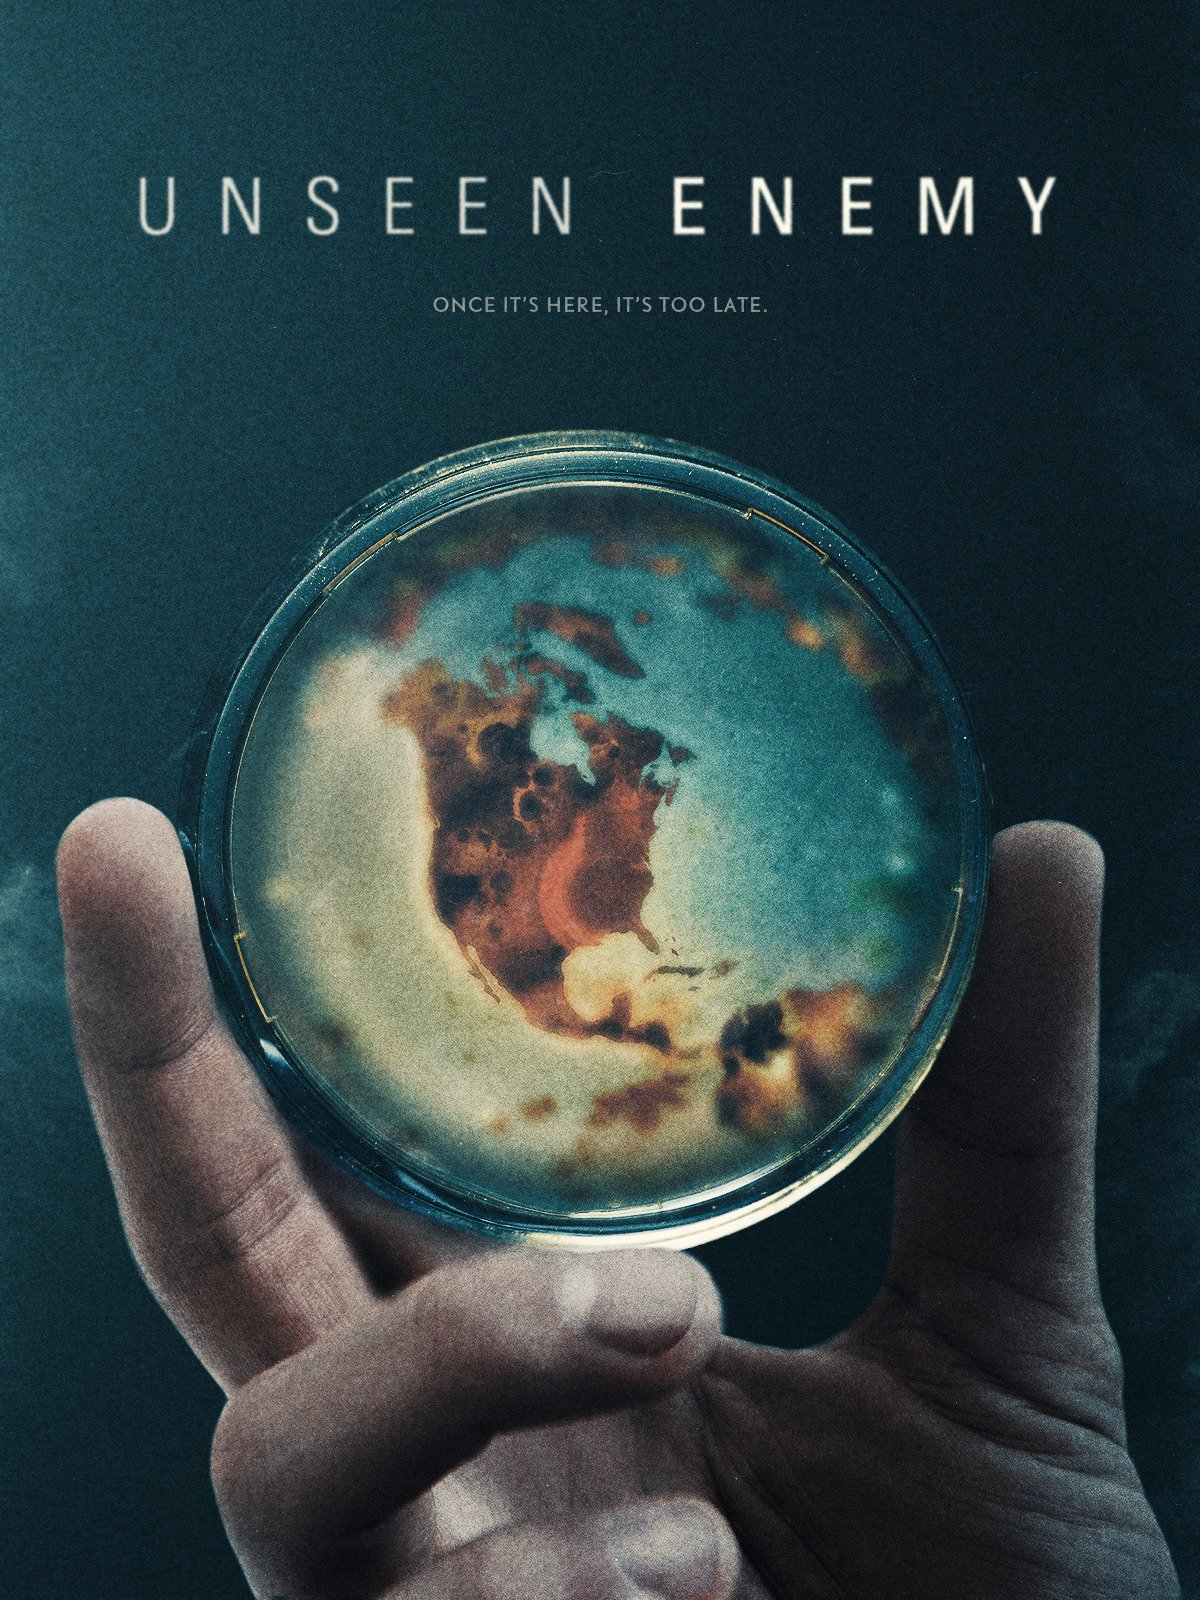 Watch Unseen Enemy online - Prime Video